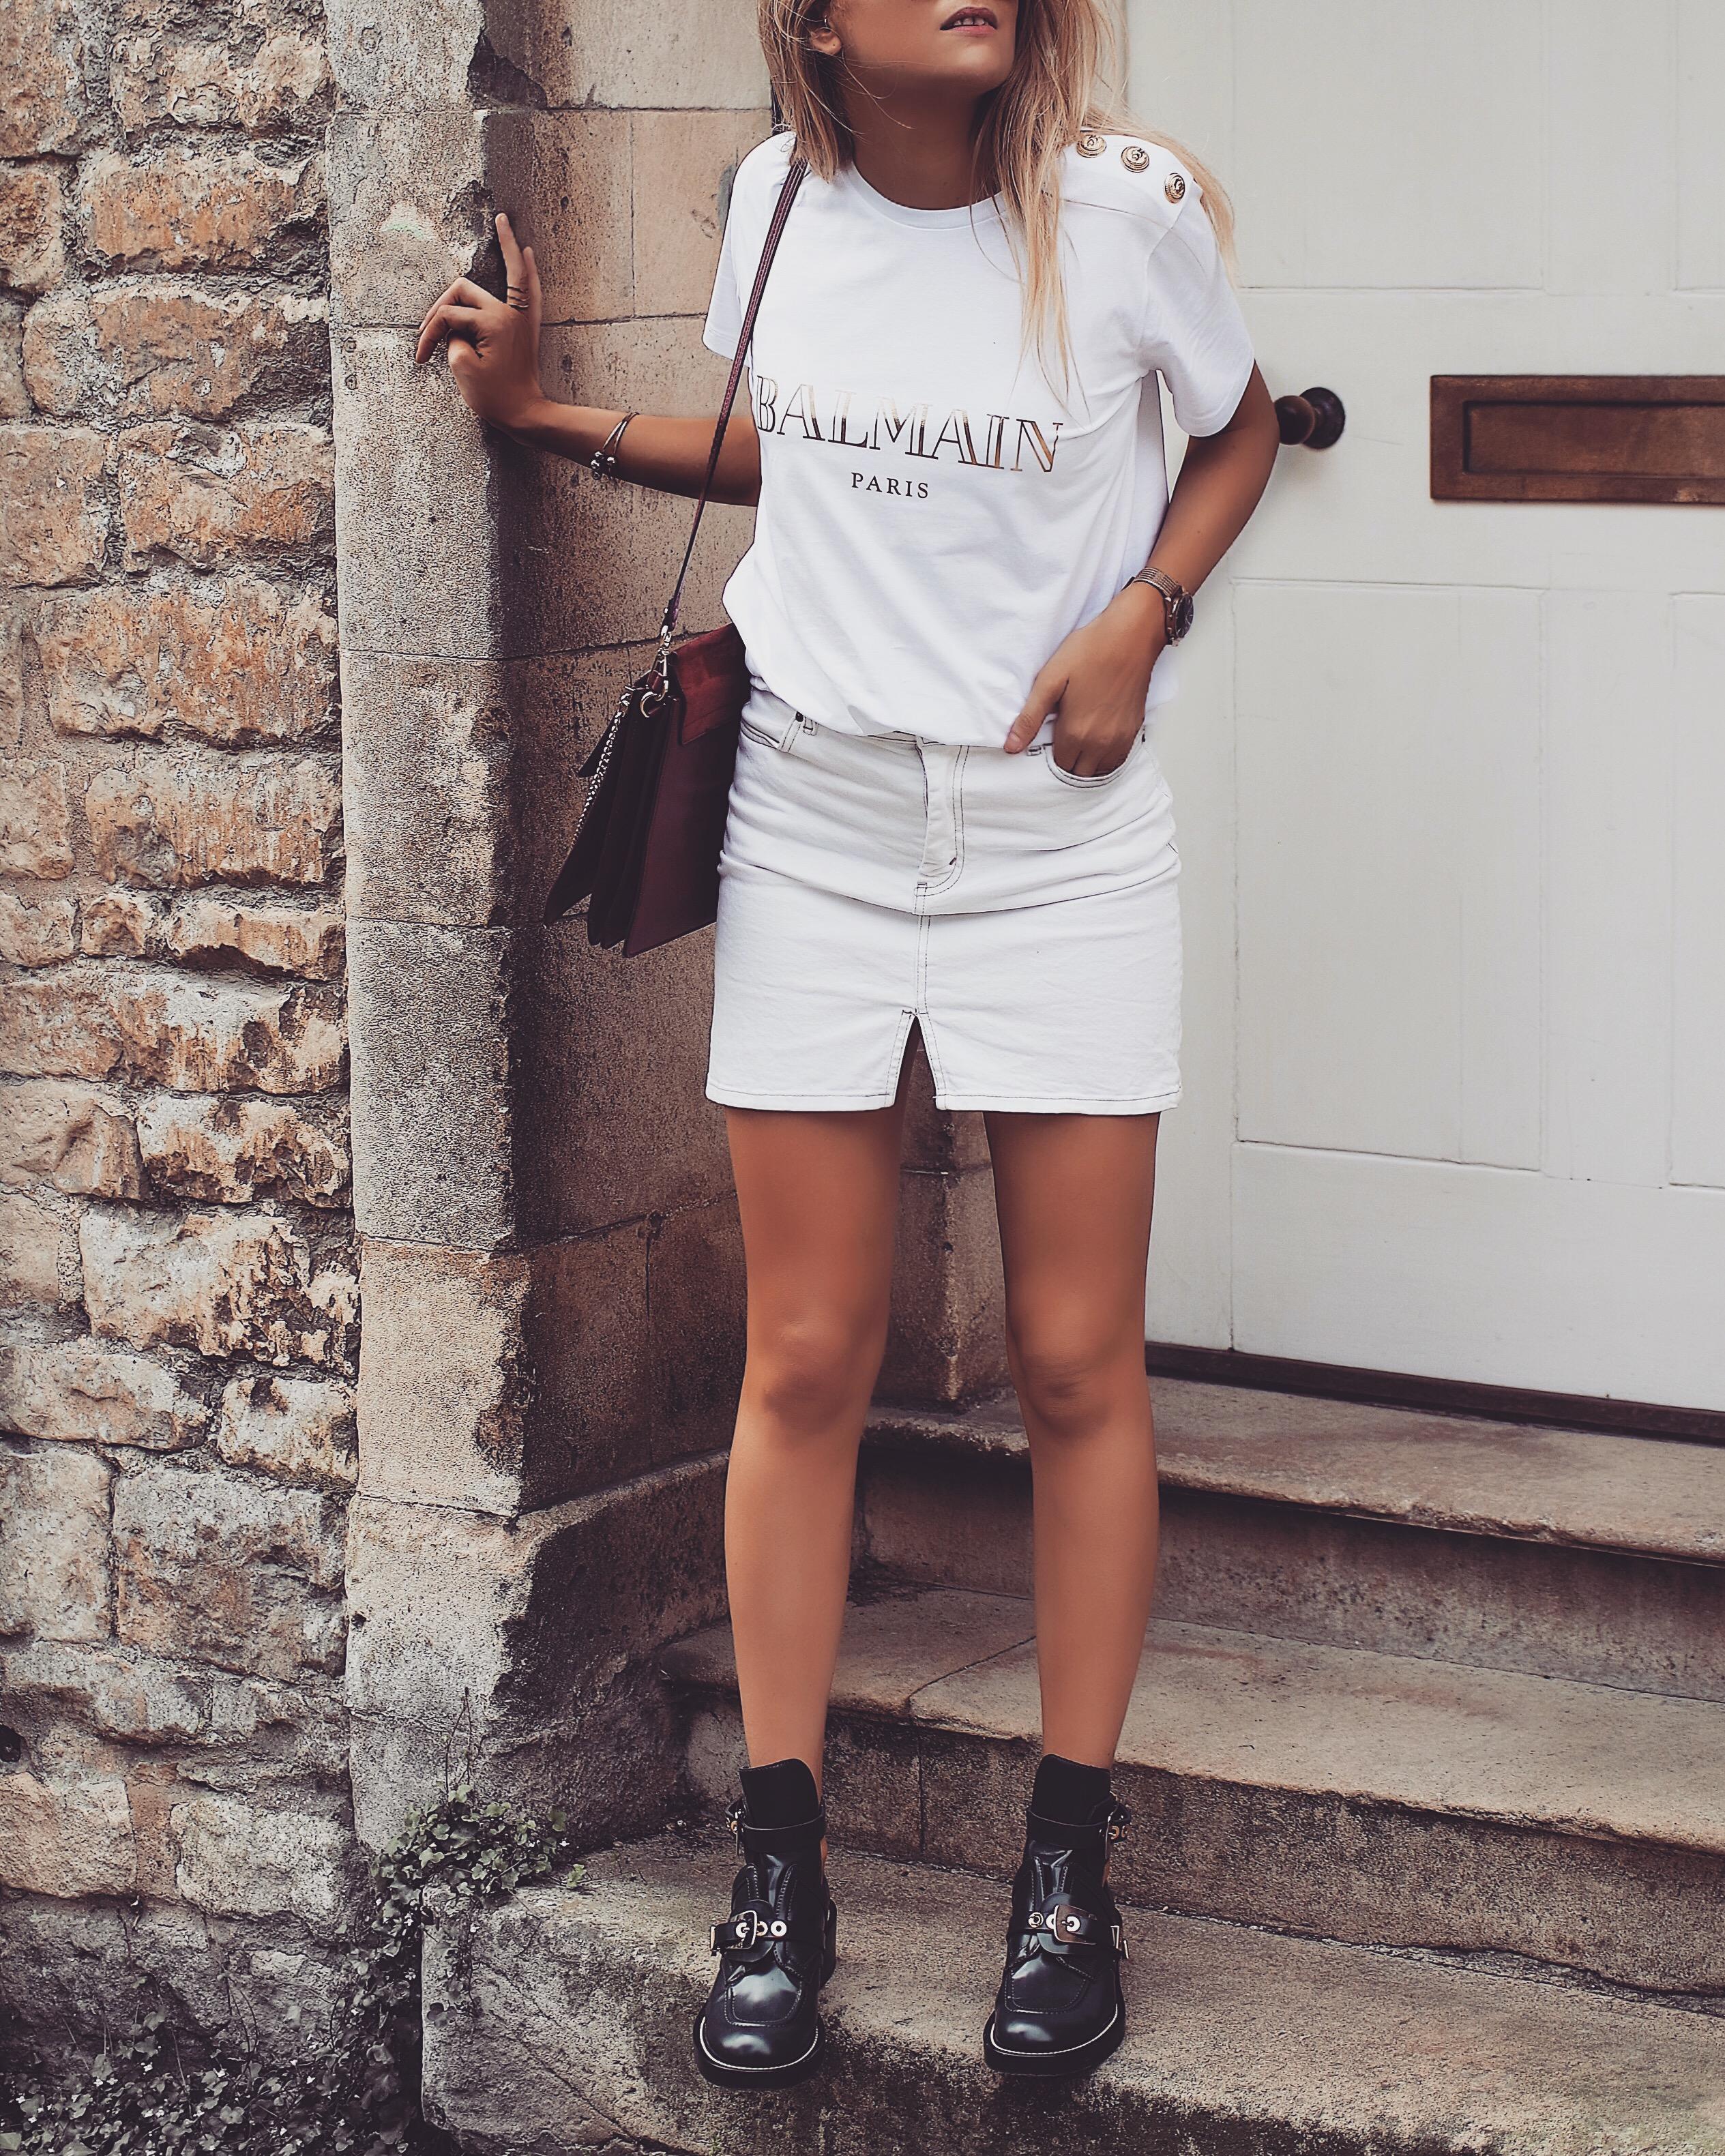 The Designer Slogan Tee - Balenciaga Cut Out Boots  7815ded4ed3f